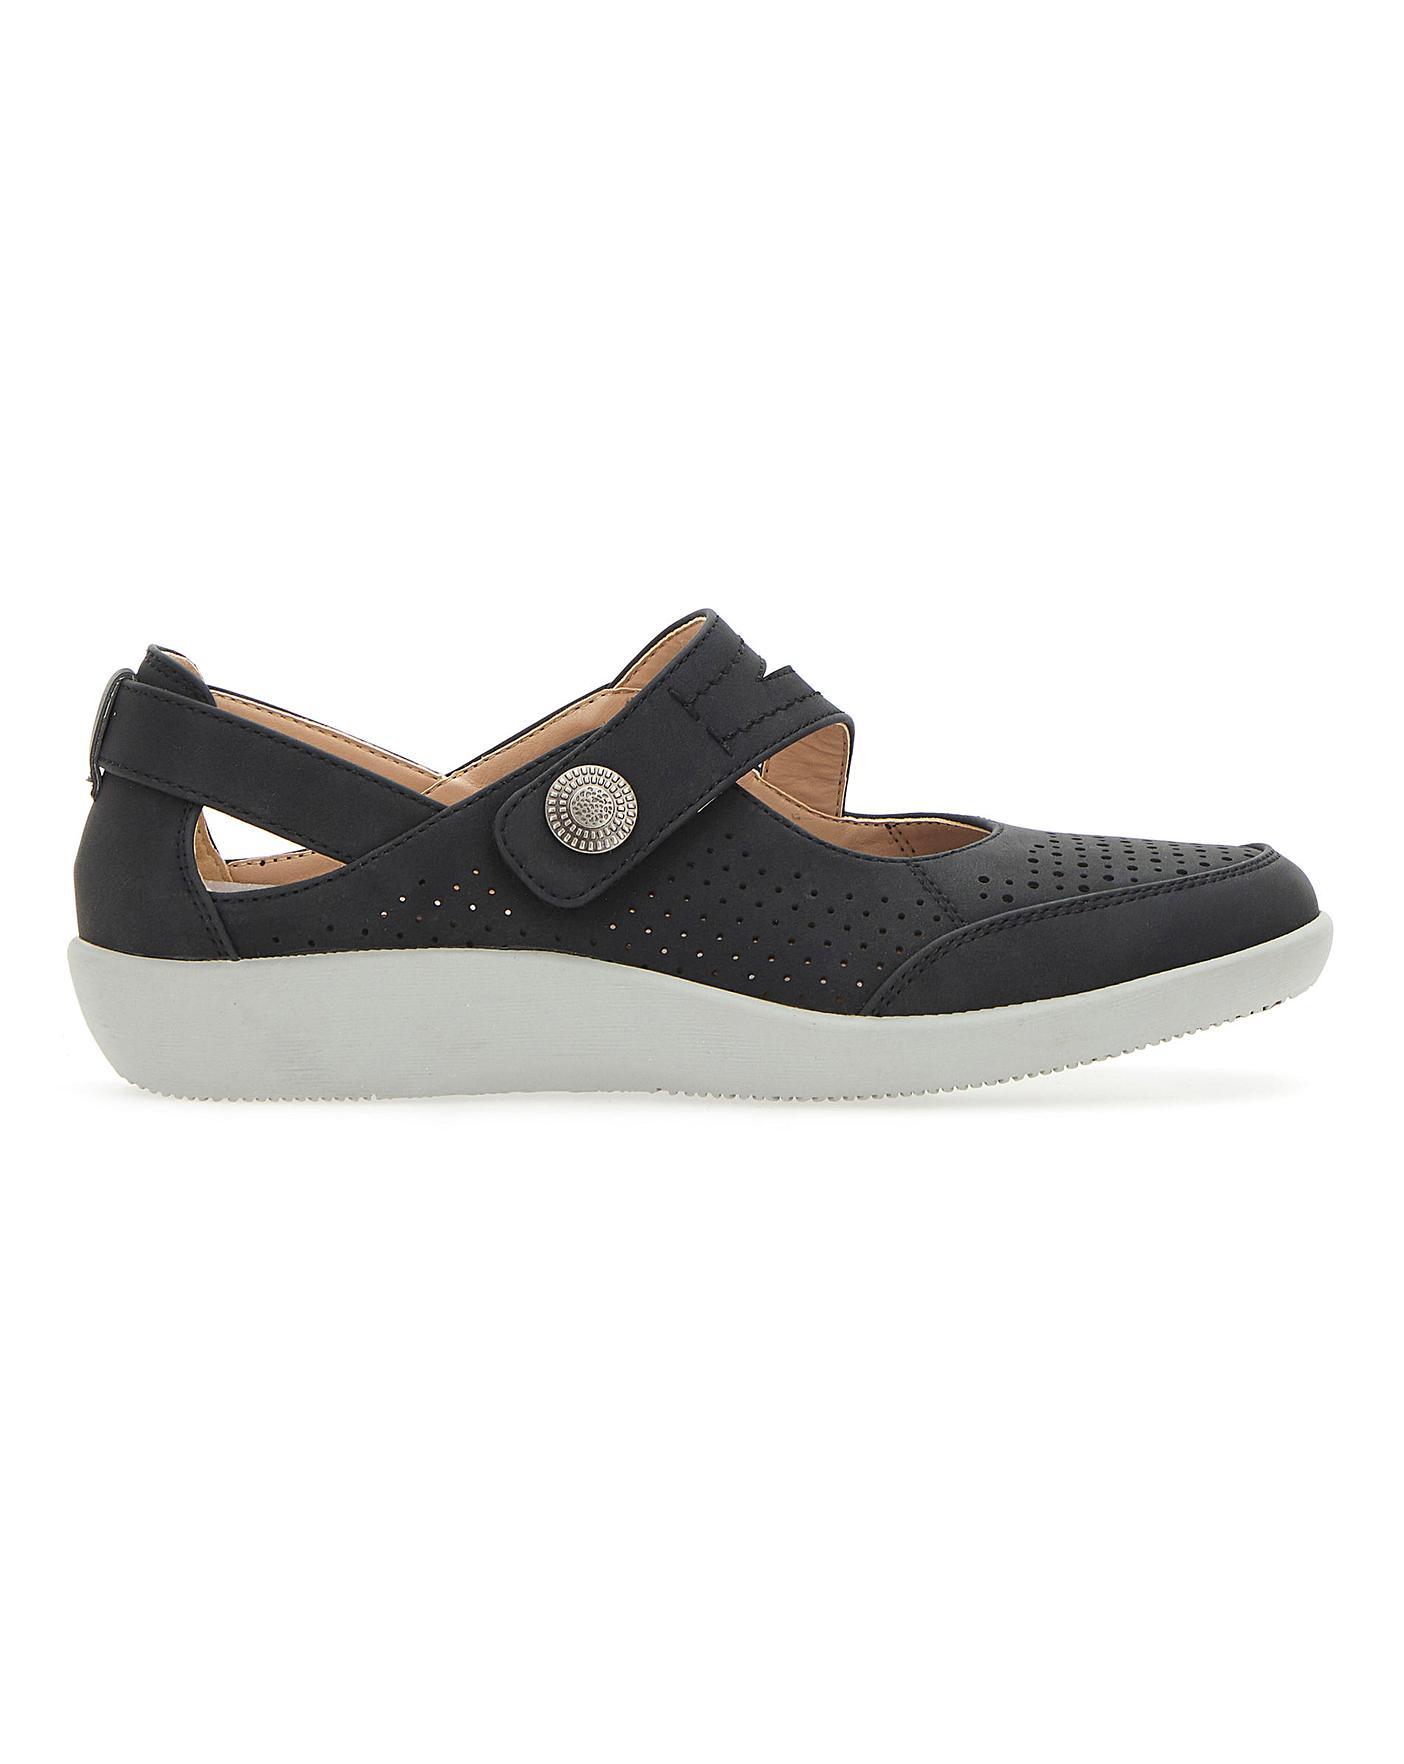 Cushion Walk Bar Shoes EEE Fit | Marisota